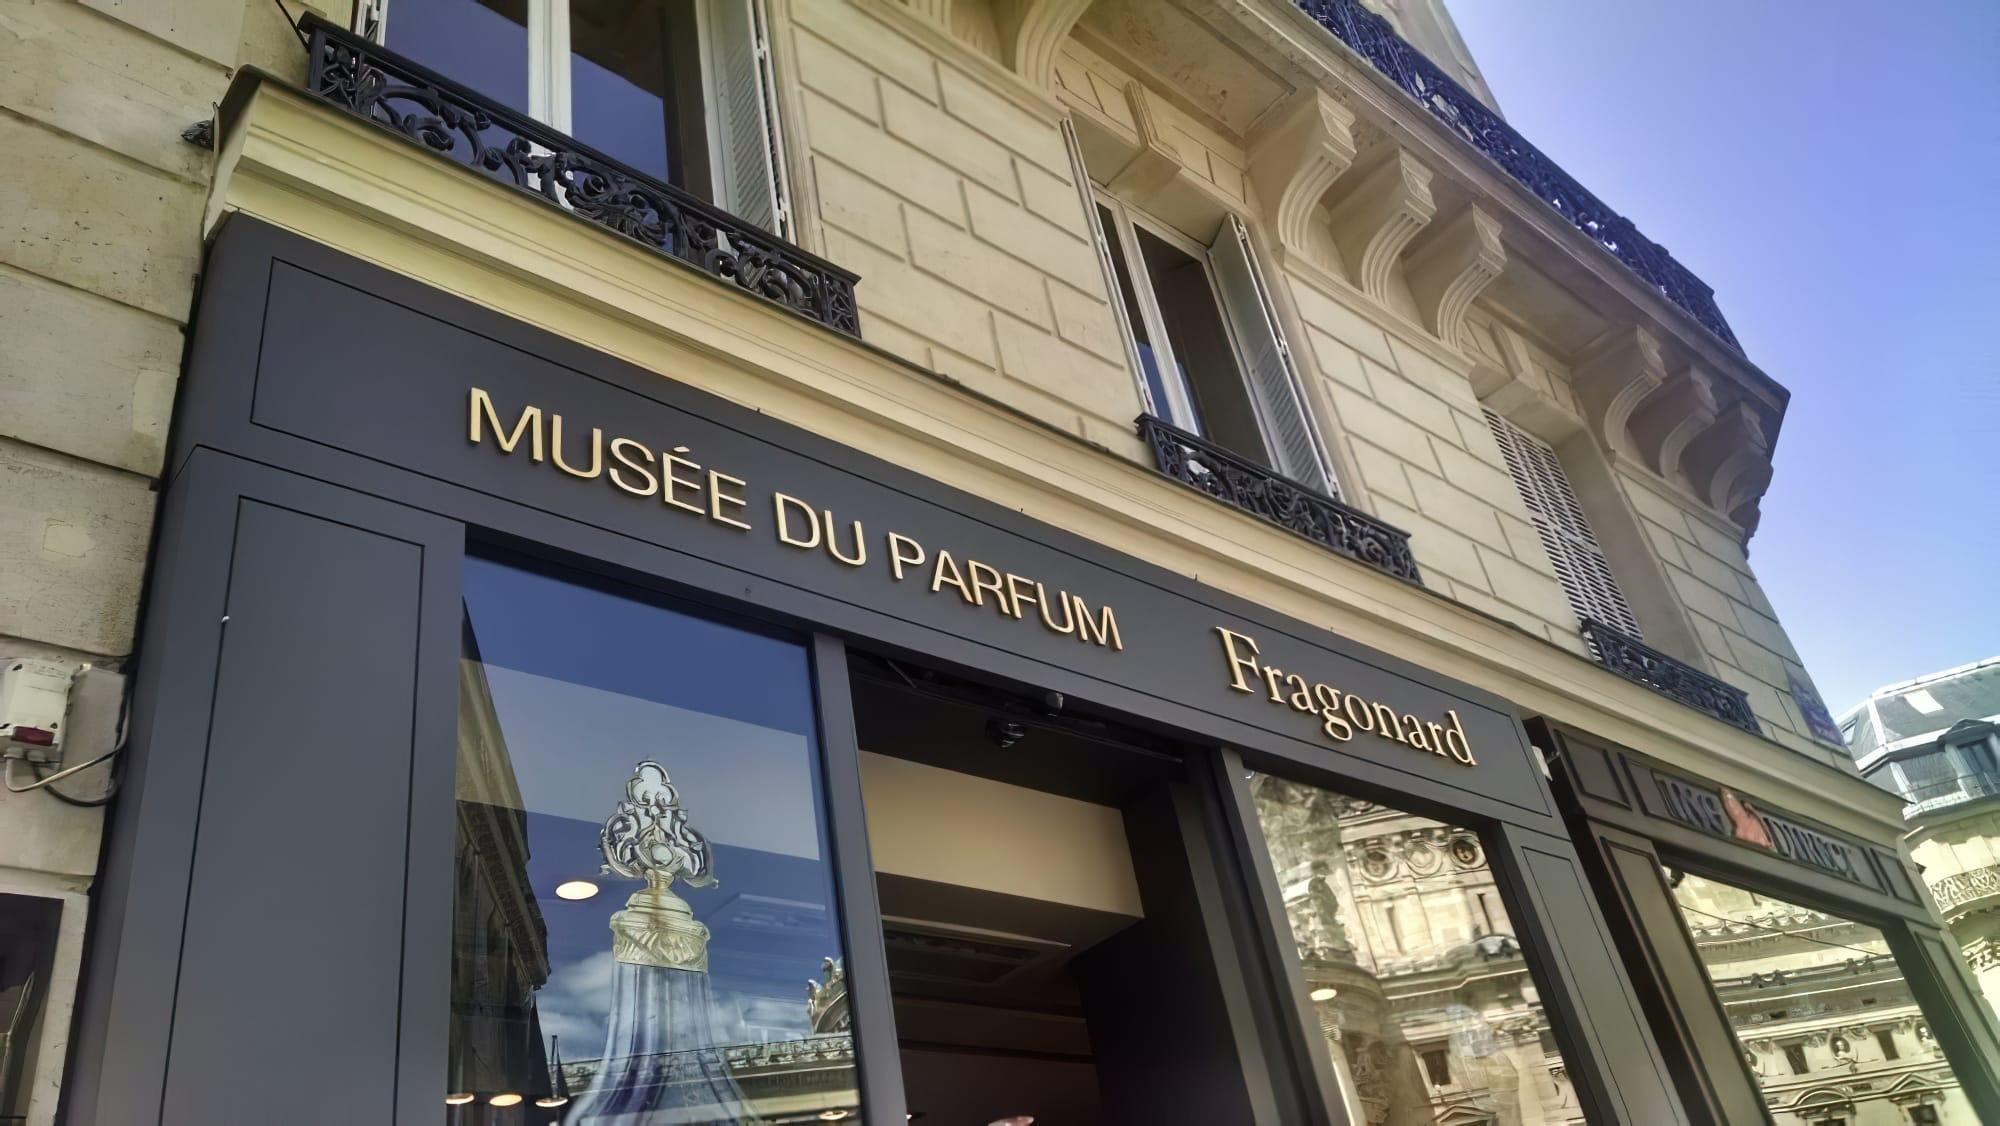 Visiter Le Musee Du Parfum Fragonard A Paris Billets Tarifs Horaires